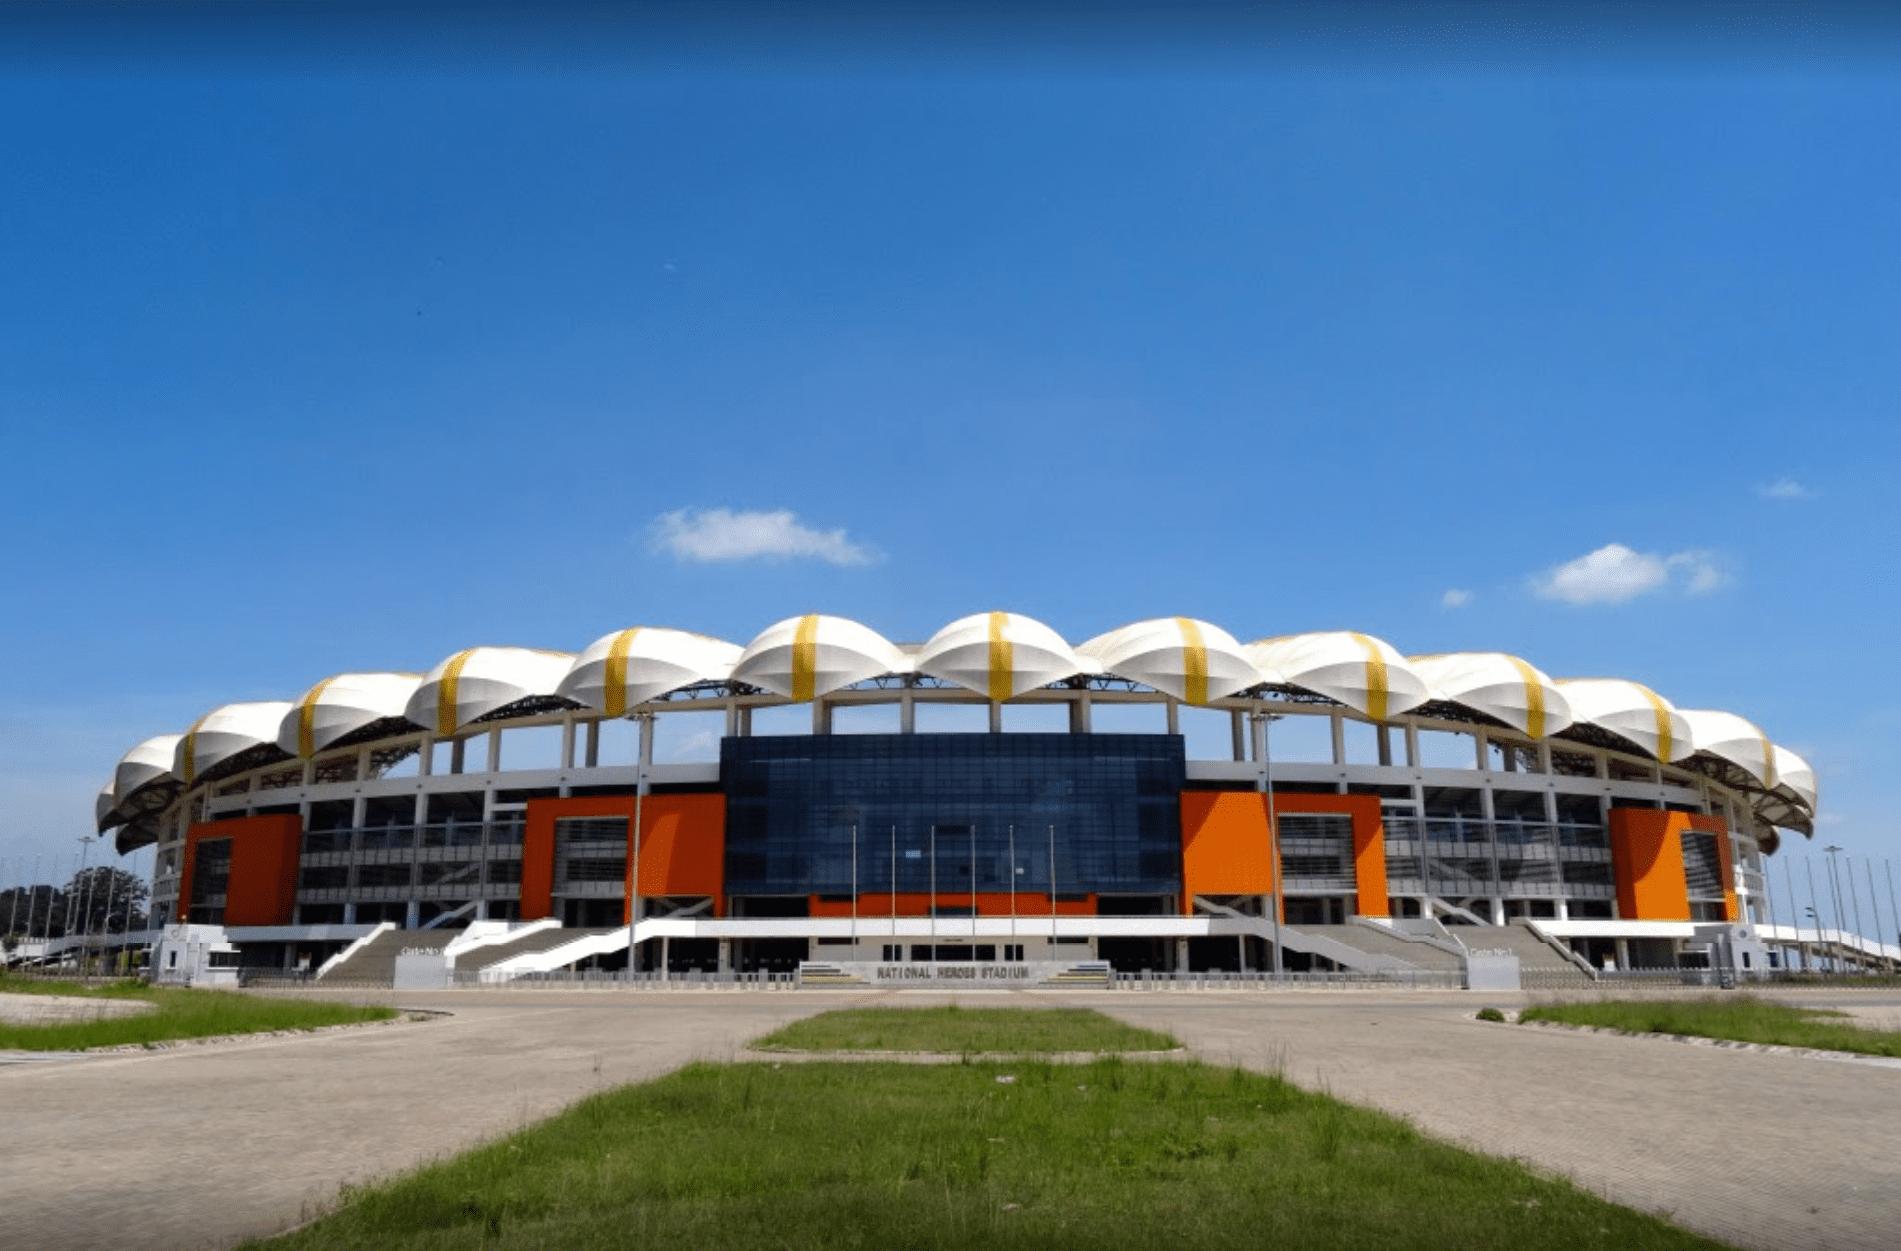 Buildings in Lusaka, Zambia: National Heroes Stadium